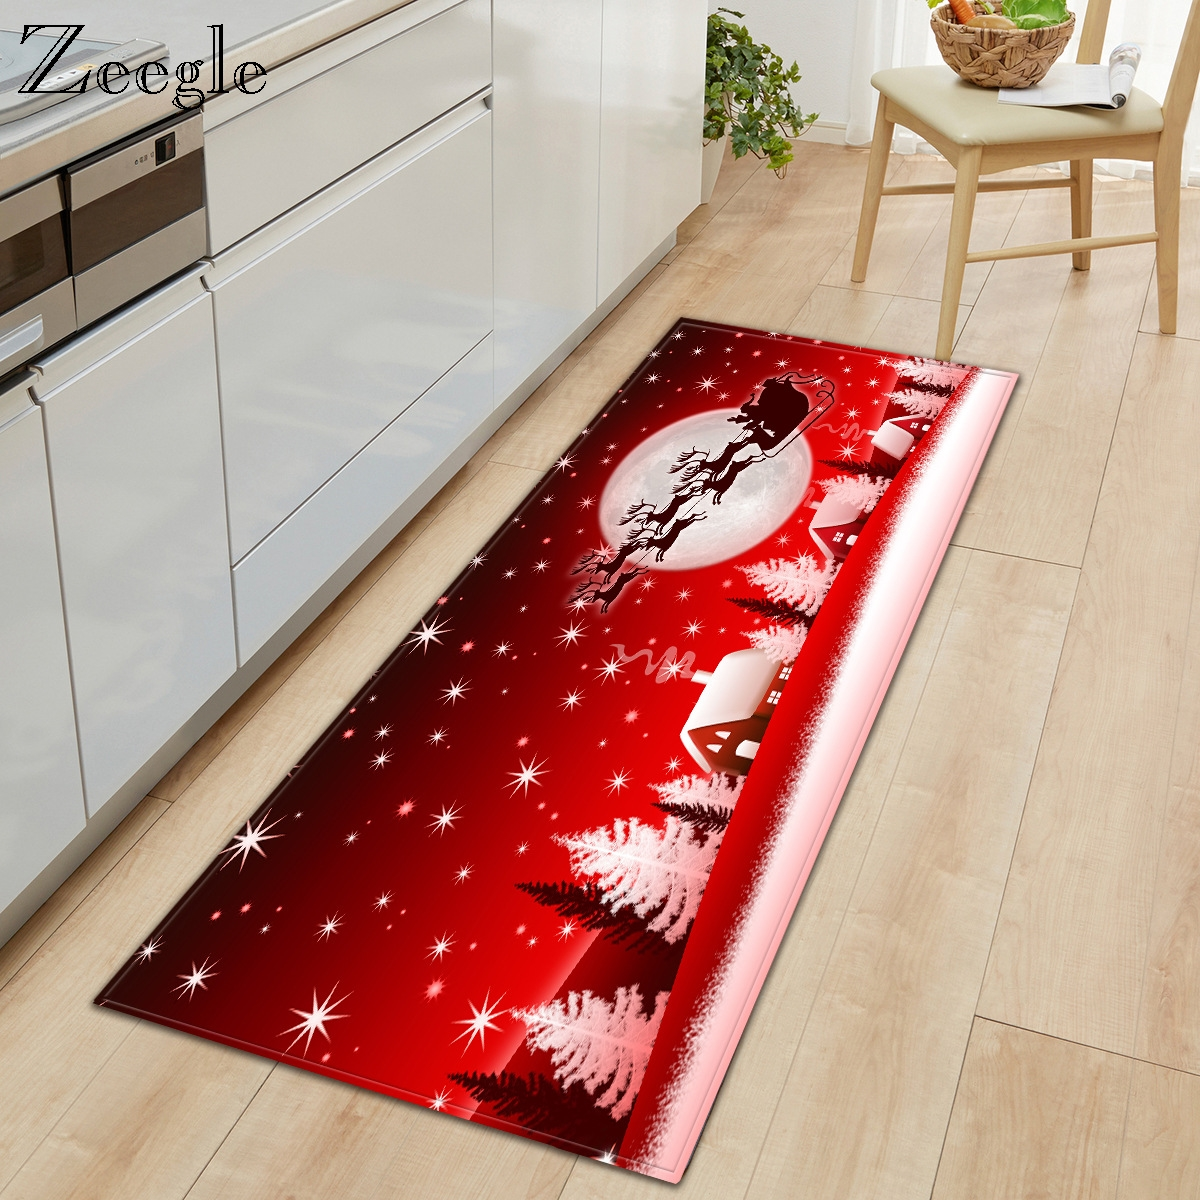 Zeegle Christmas Carept Anti Slip Kitchen Rug Living Room Carpet Soft Foot Mat Hallway Rug Absorbent Bathroom Doormat Shower Mat